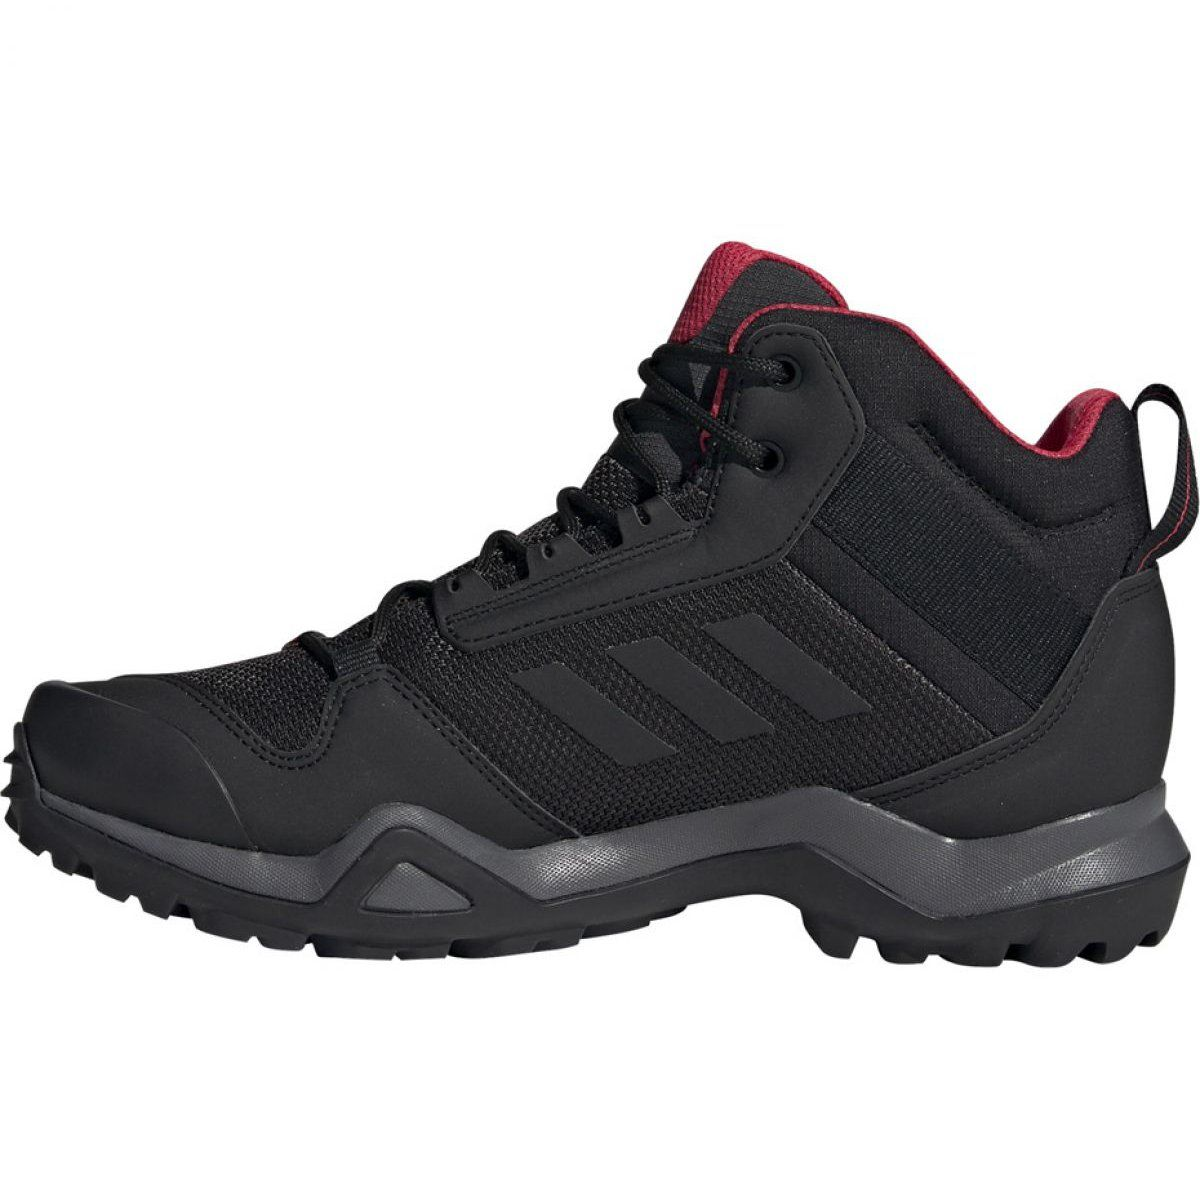 Buty Trekkingowe Adidas Terrex Ax3 Mid Gtx W Bc0590 Czarne Trekking Shoes Adidas Shoes Women Adidas Shoes